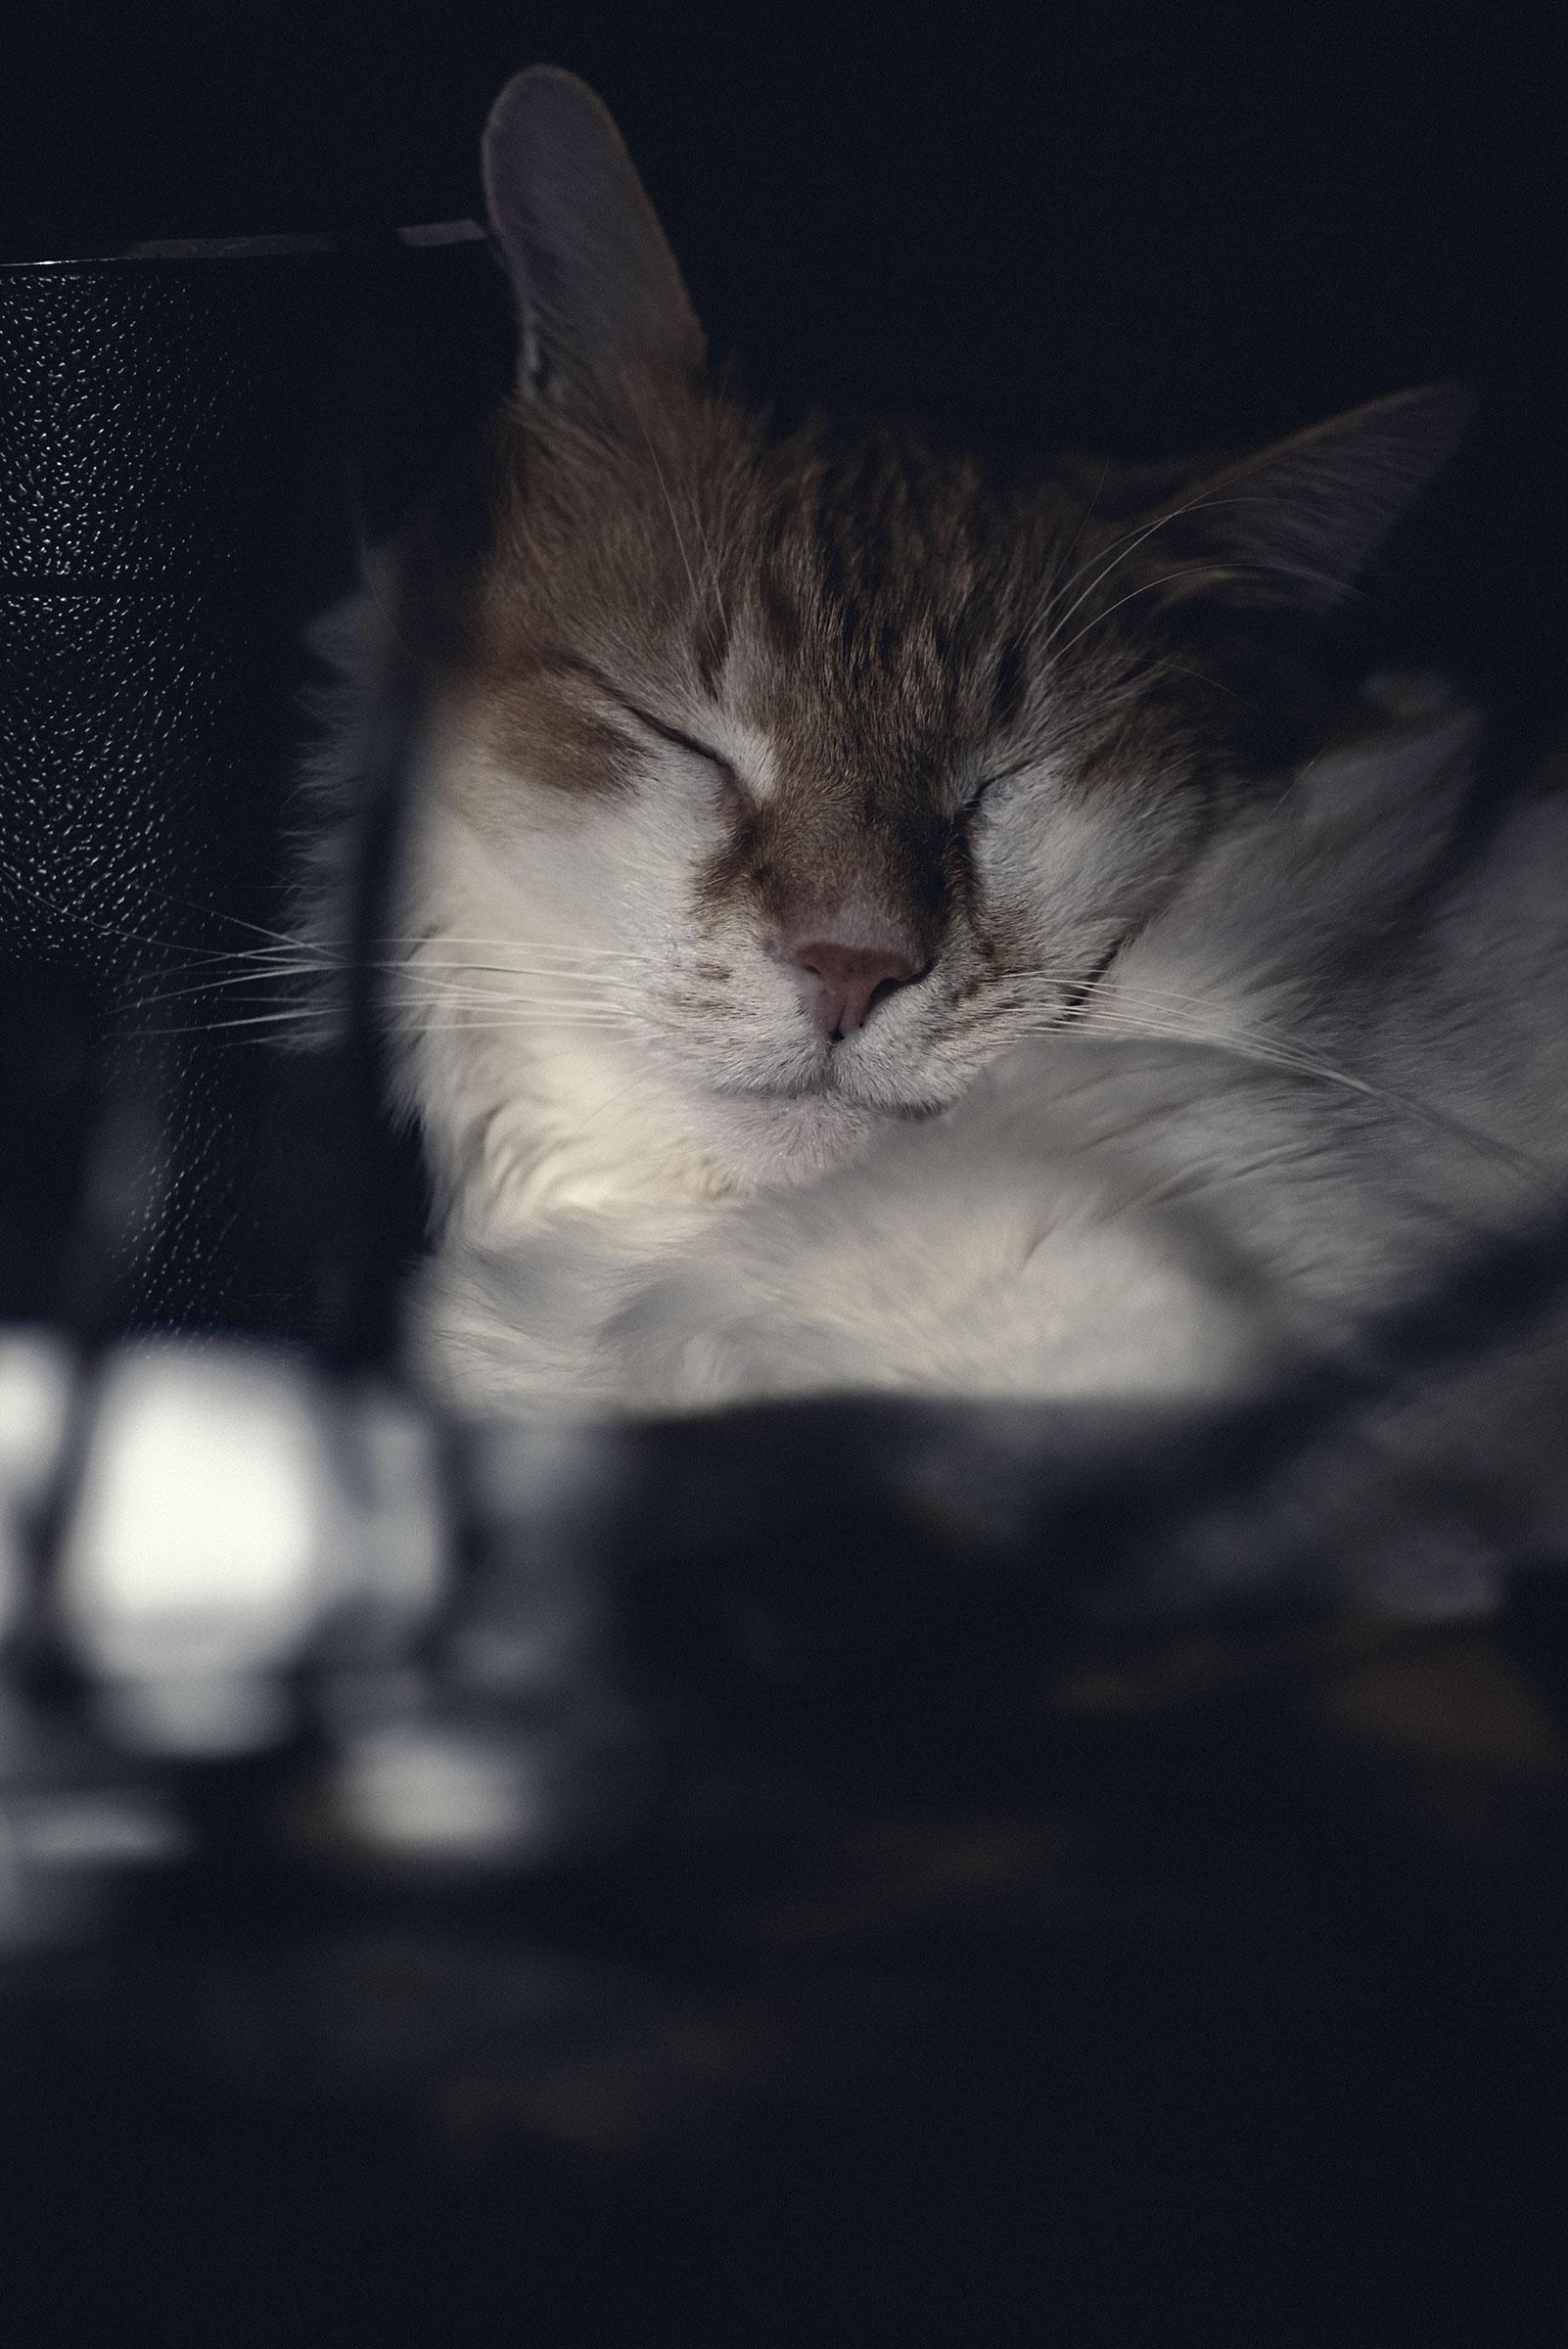 RonFF, notturno a 135mm sul mio davanzale...